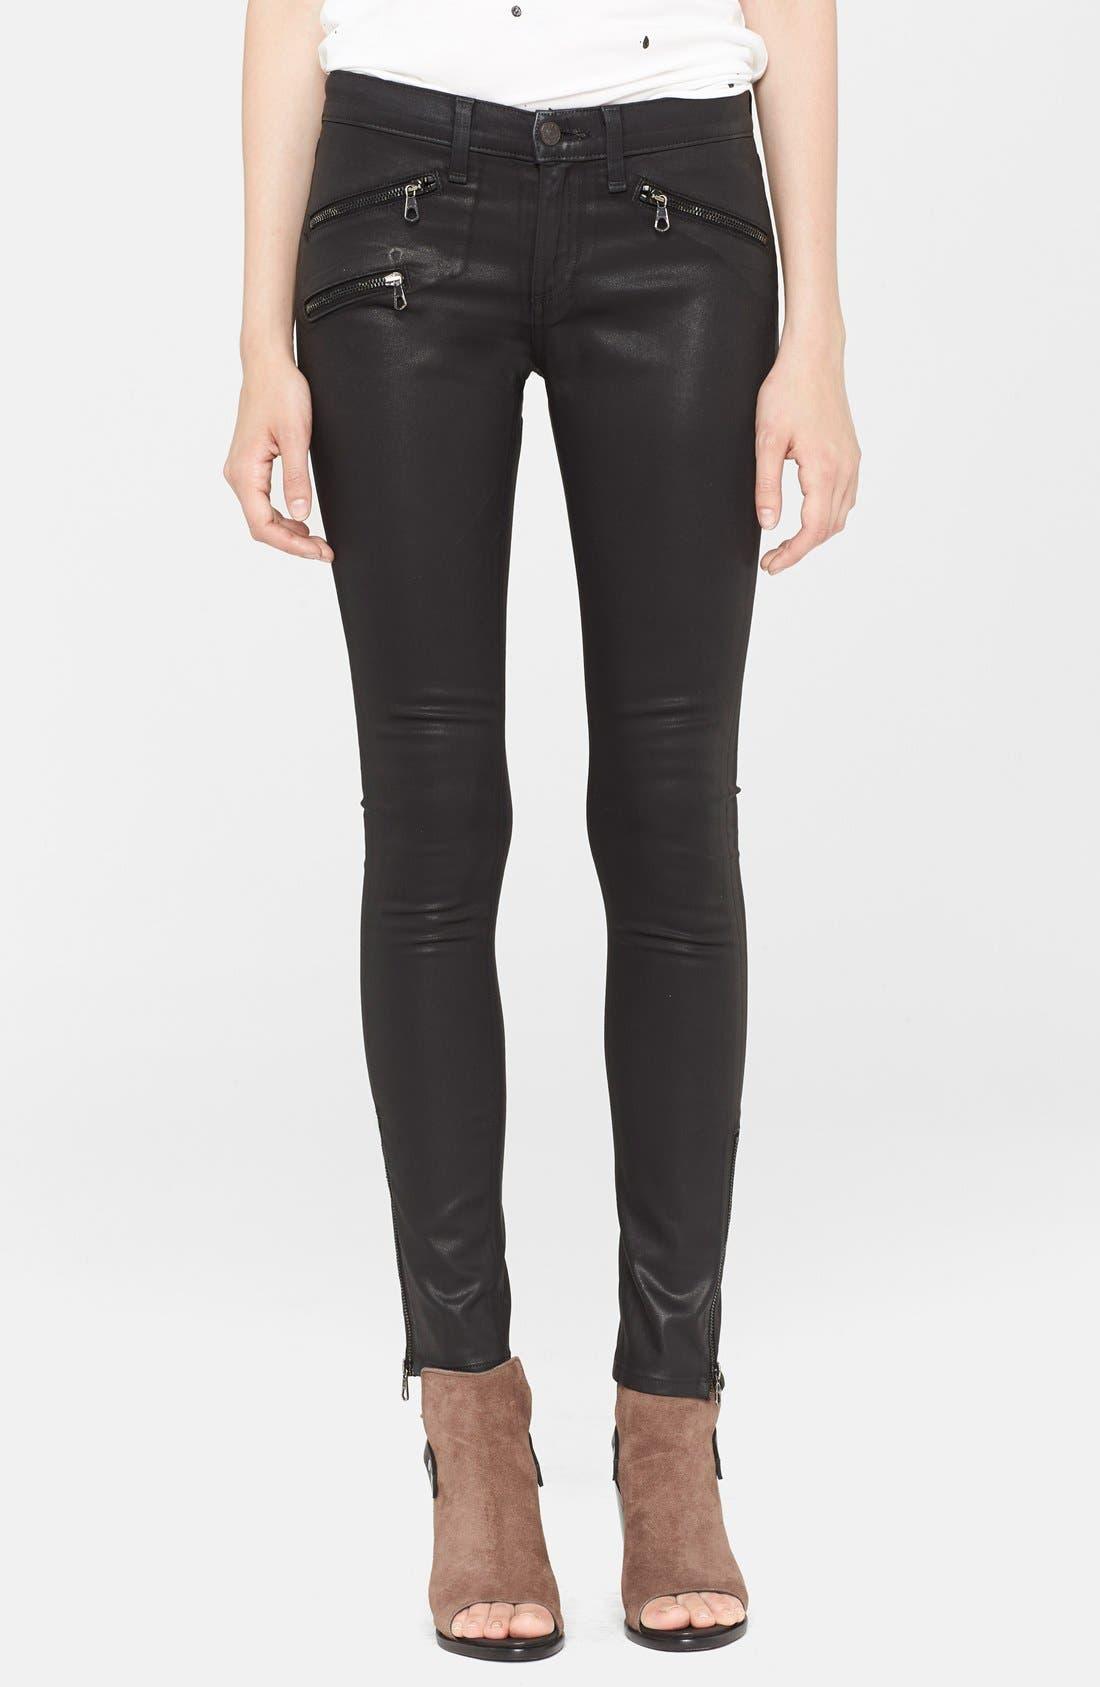 Main Image - rag & bone/JEAN Coated Ankle Zip Skinny Jeans (Coated Black)